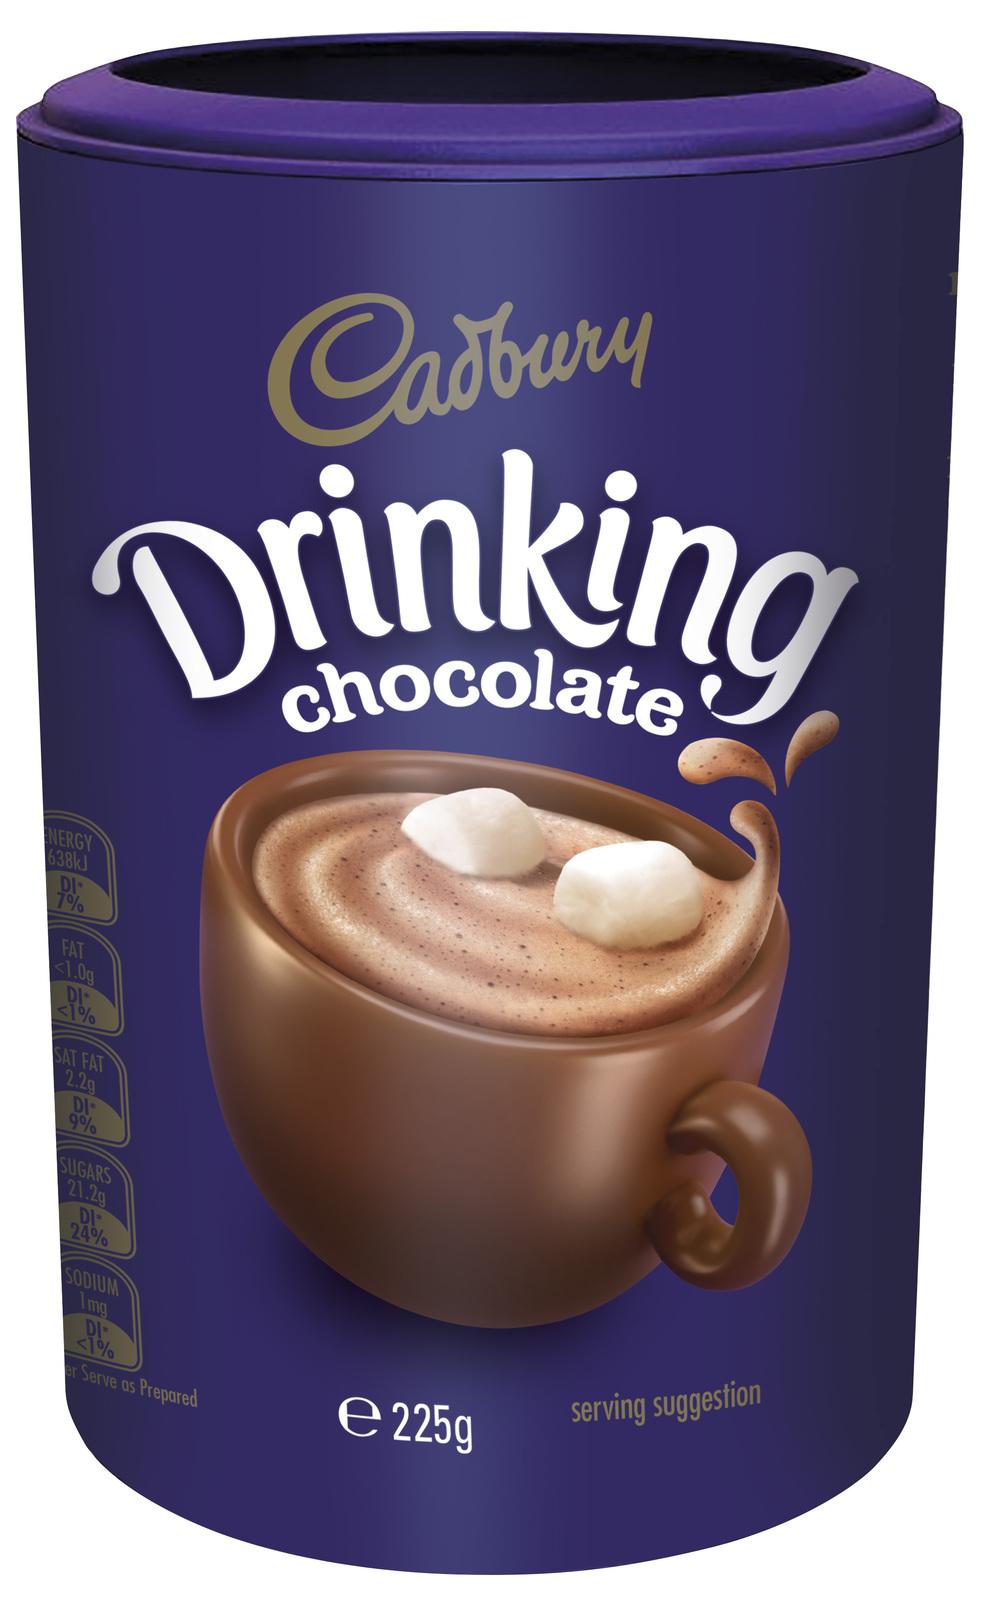 Cadbury Drinking Chocolate (225g) image